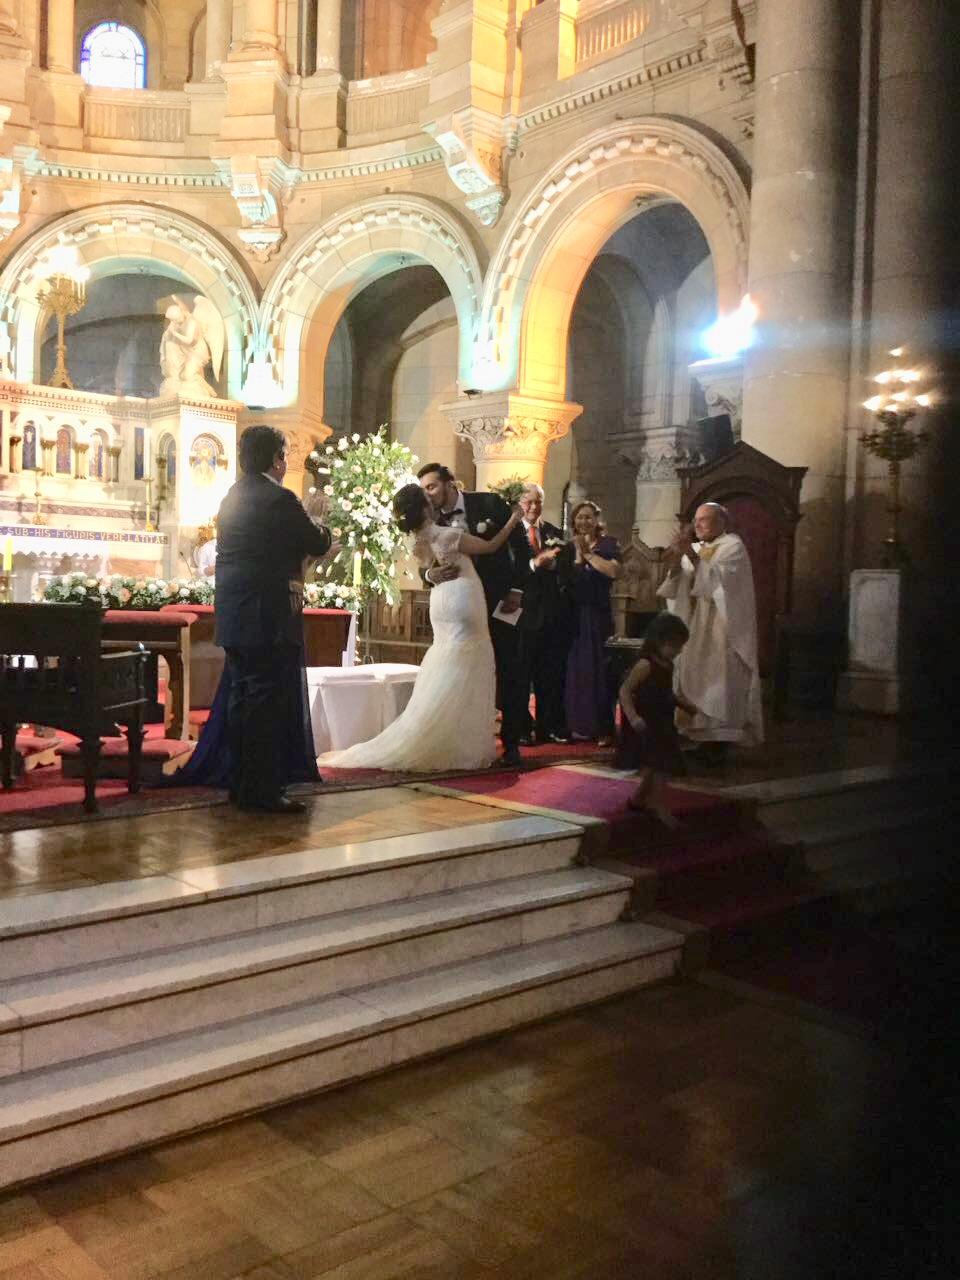 Iglesia de los sacramentinos, santigo de chile. Coro para matrimonios